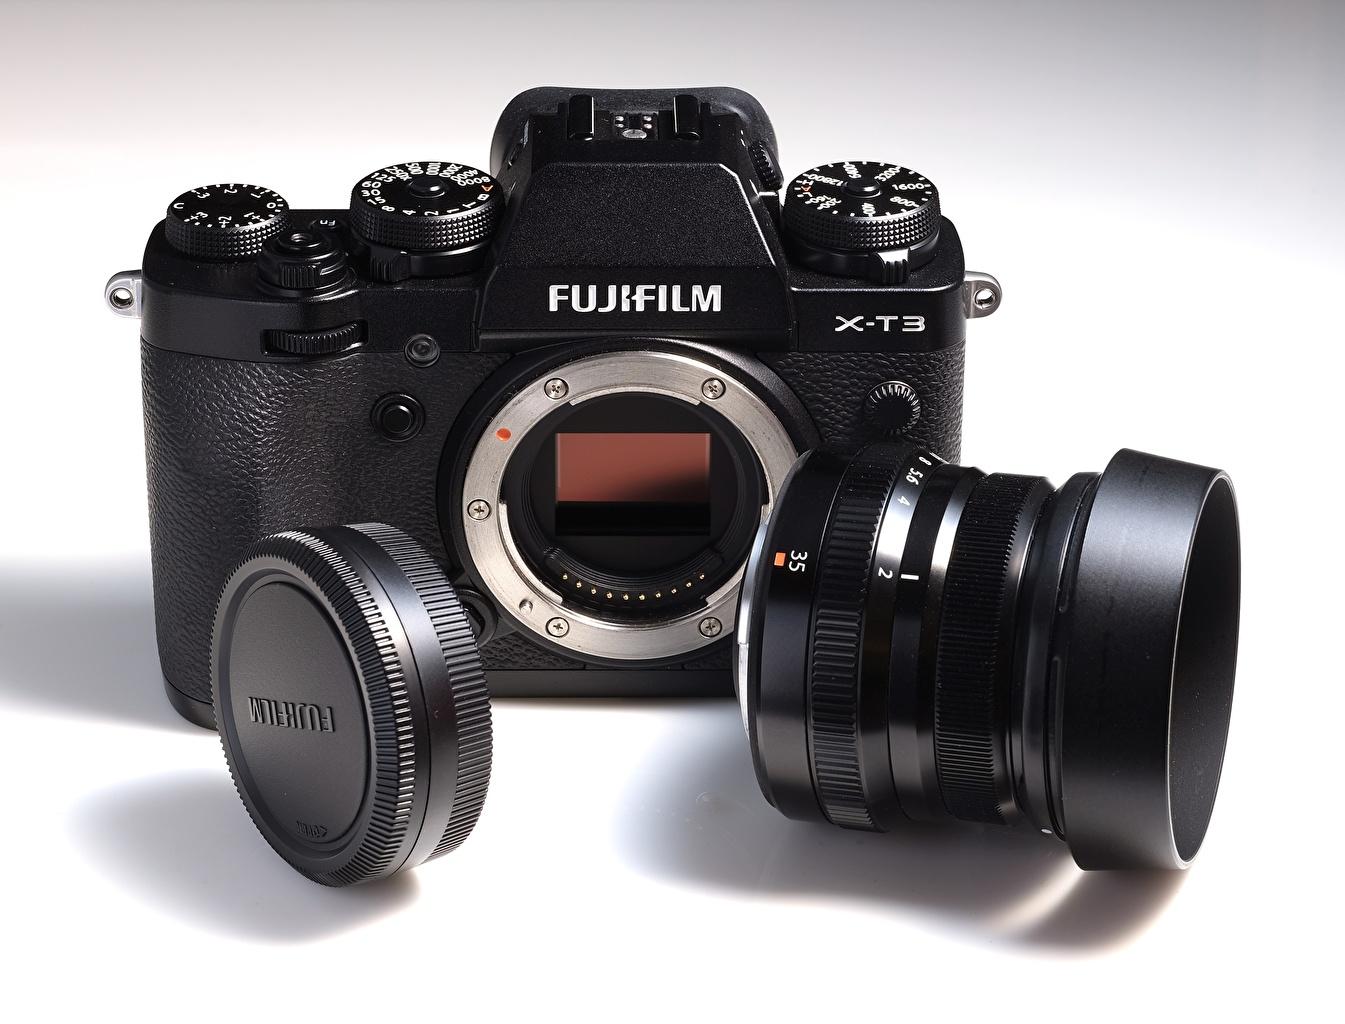 Fotos Objektiv Fotoapparat FUJIFILM, X-T3 Großansicht hautnah Nahaufnahme